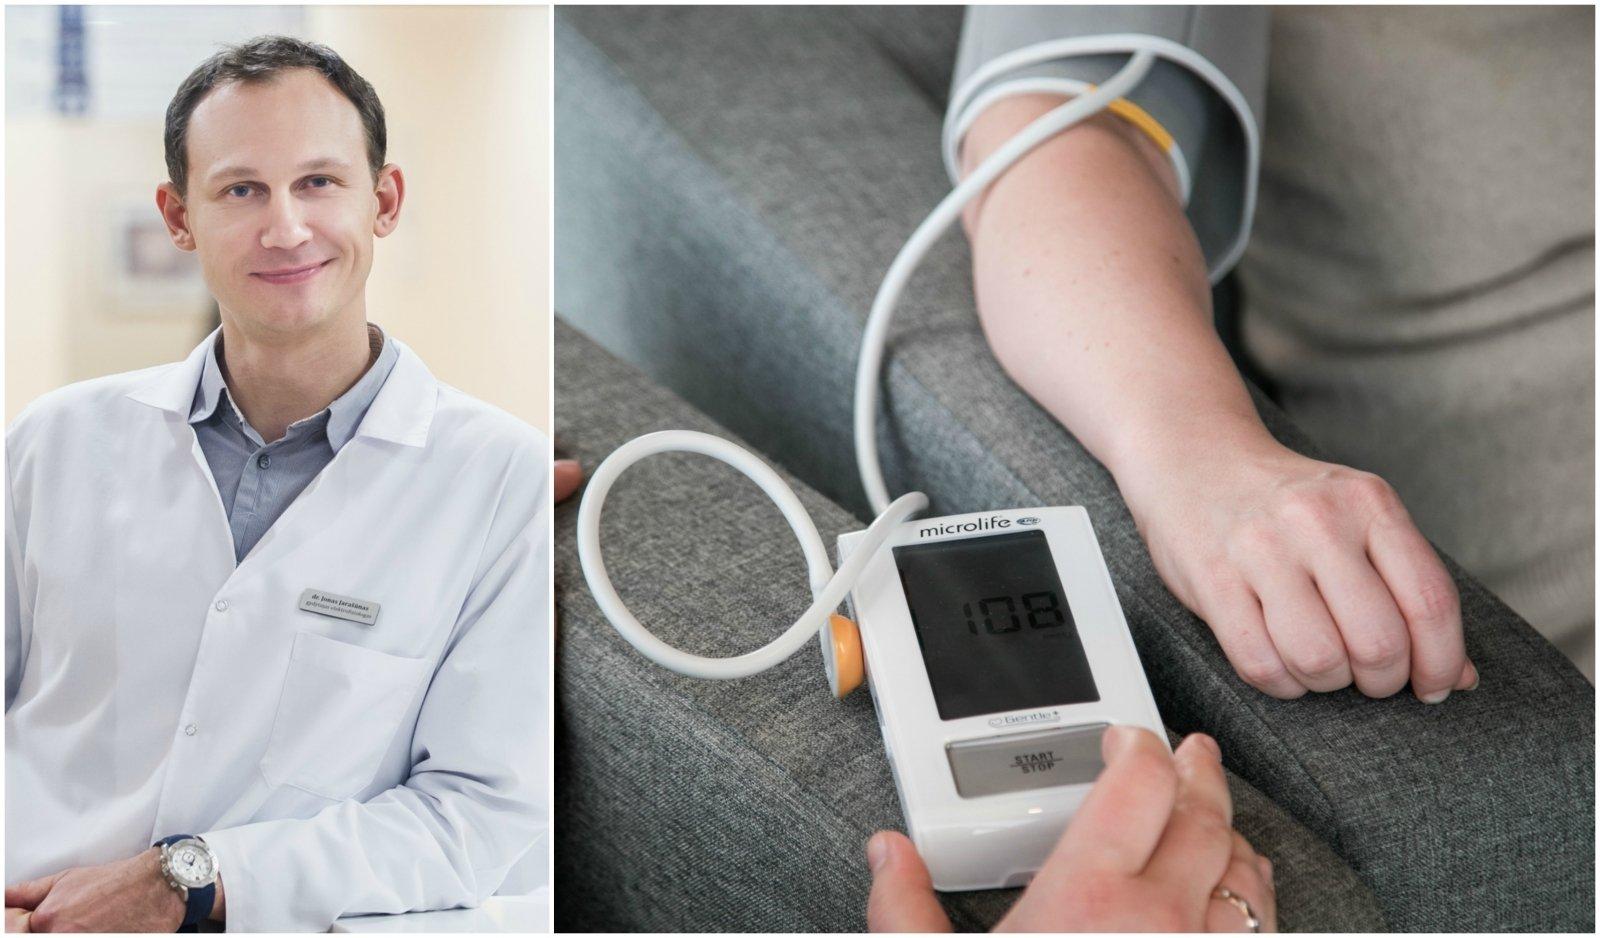 hipertenzija naudingi patarimai